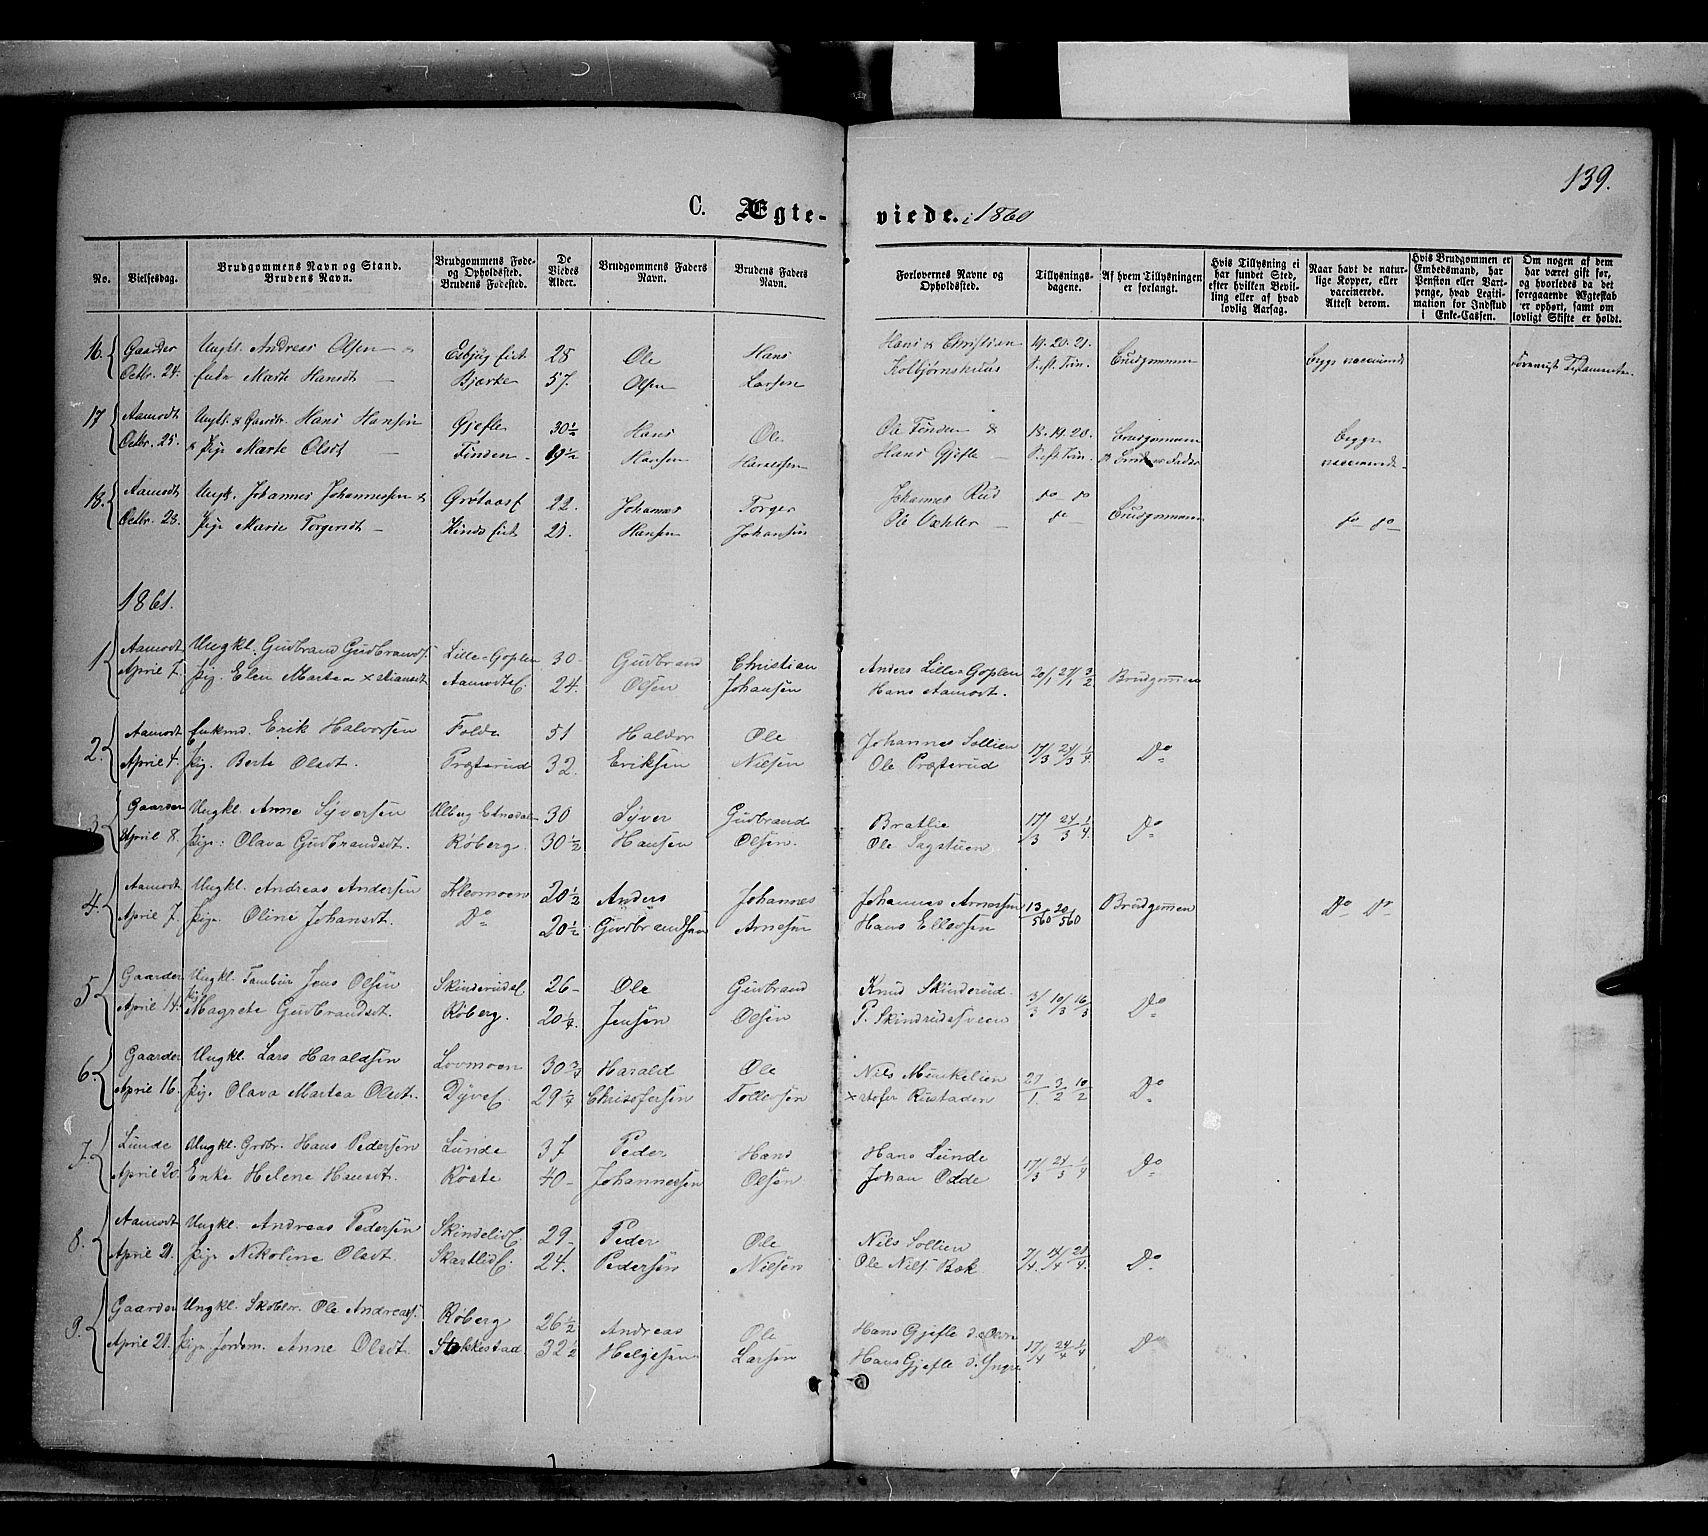 SAH, Nordre Land prestekontor, Ministerialbok nr. 1, 1860-1871, s. 139